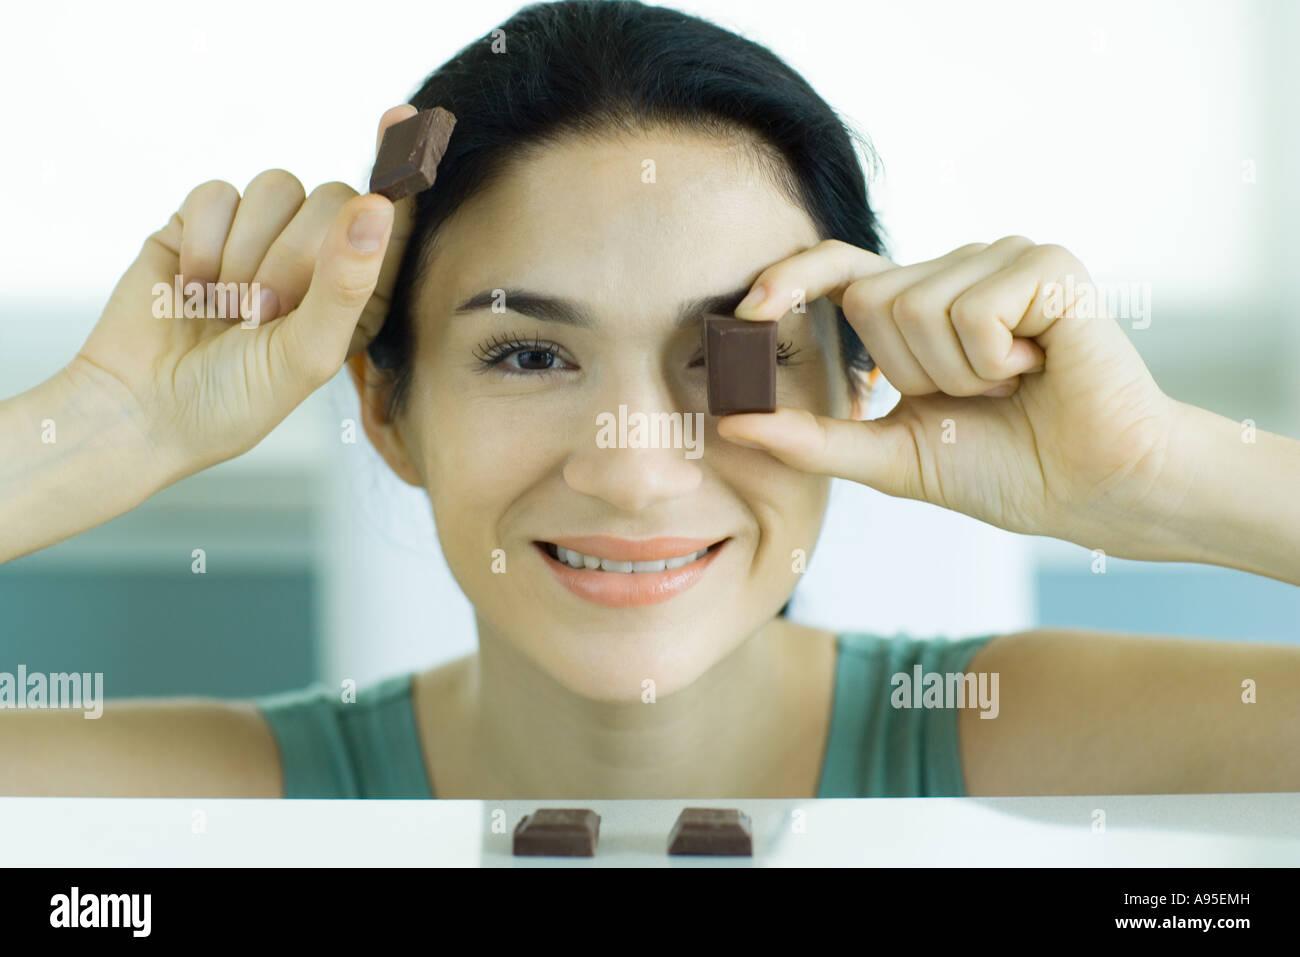 Frau hält sich Stücke von Schokolade Stockbild